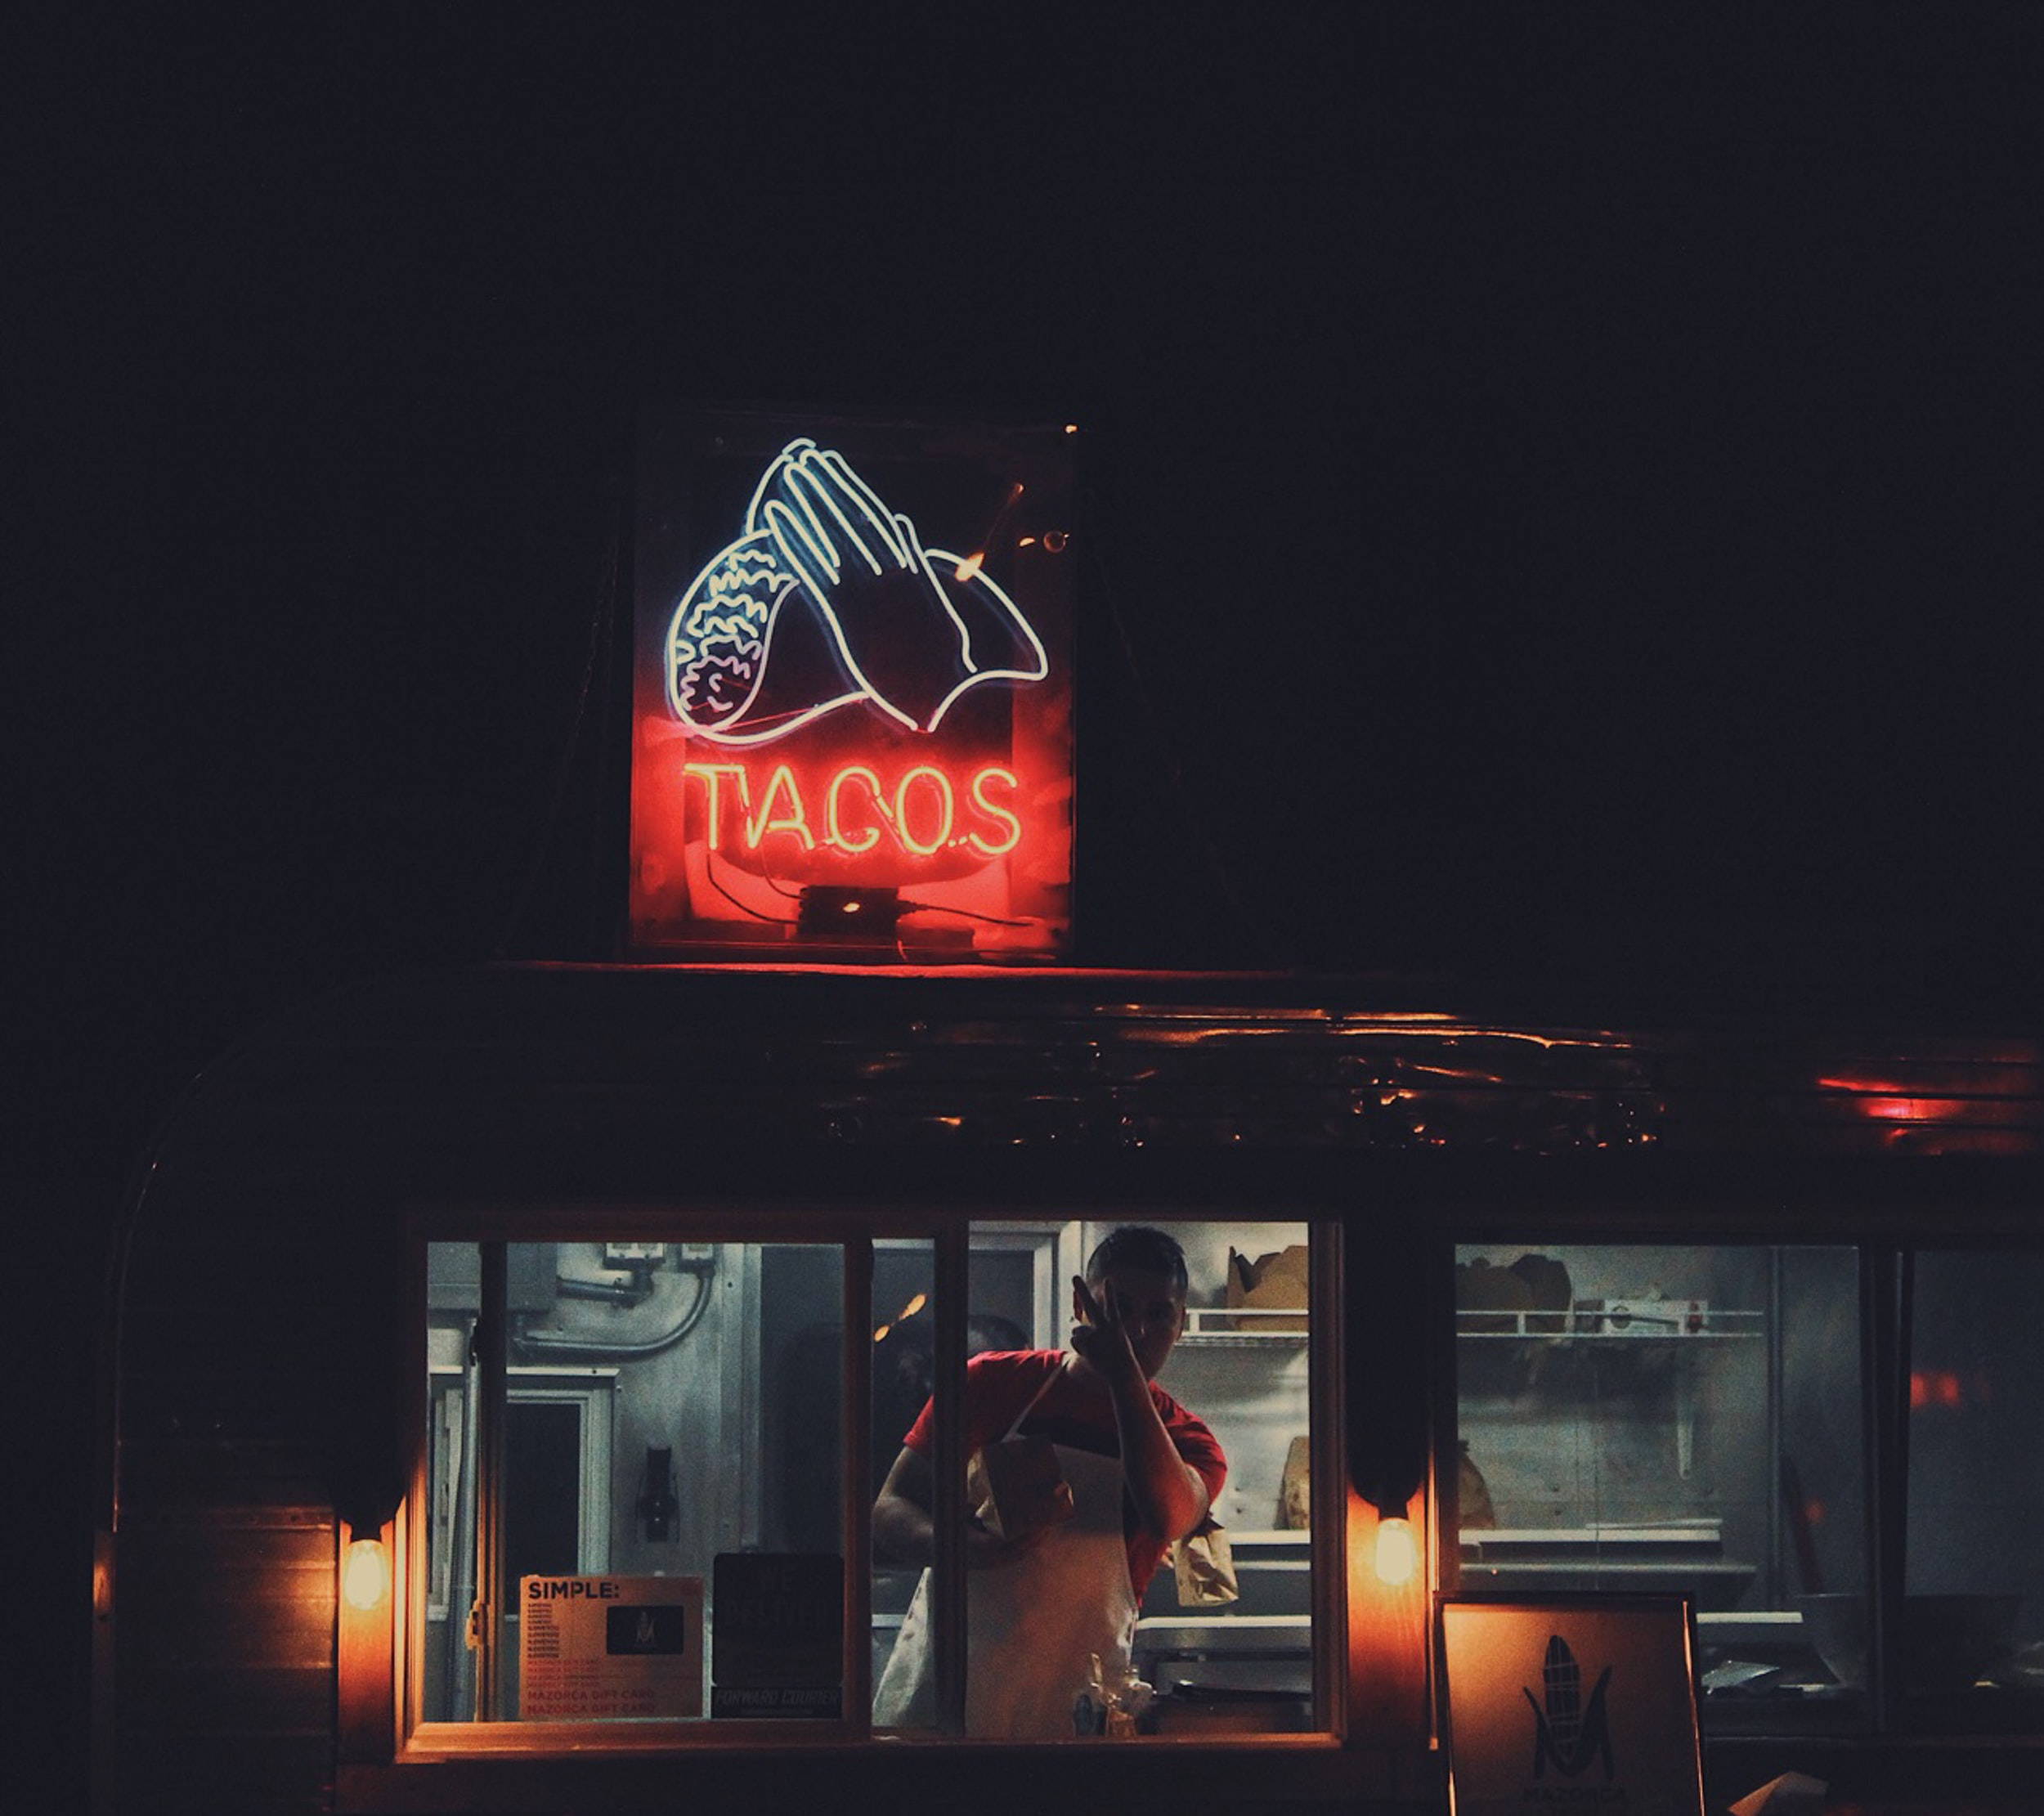 Tacos food stall